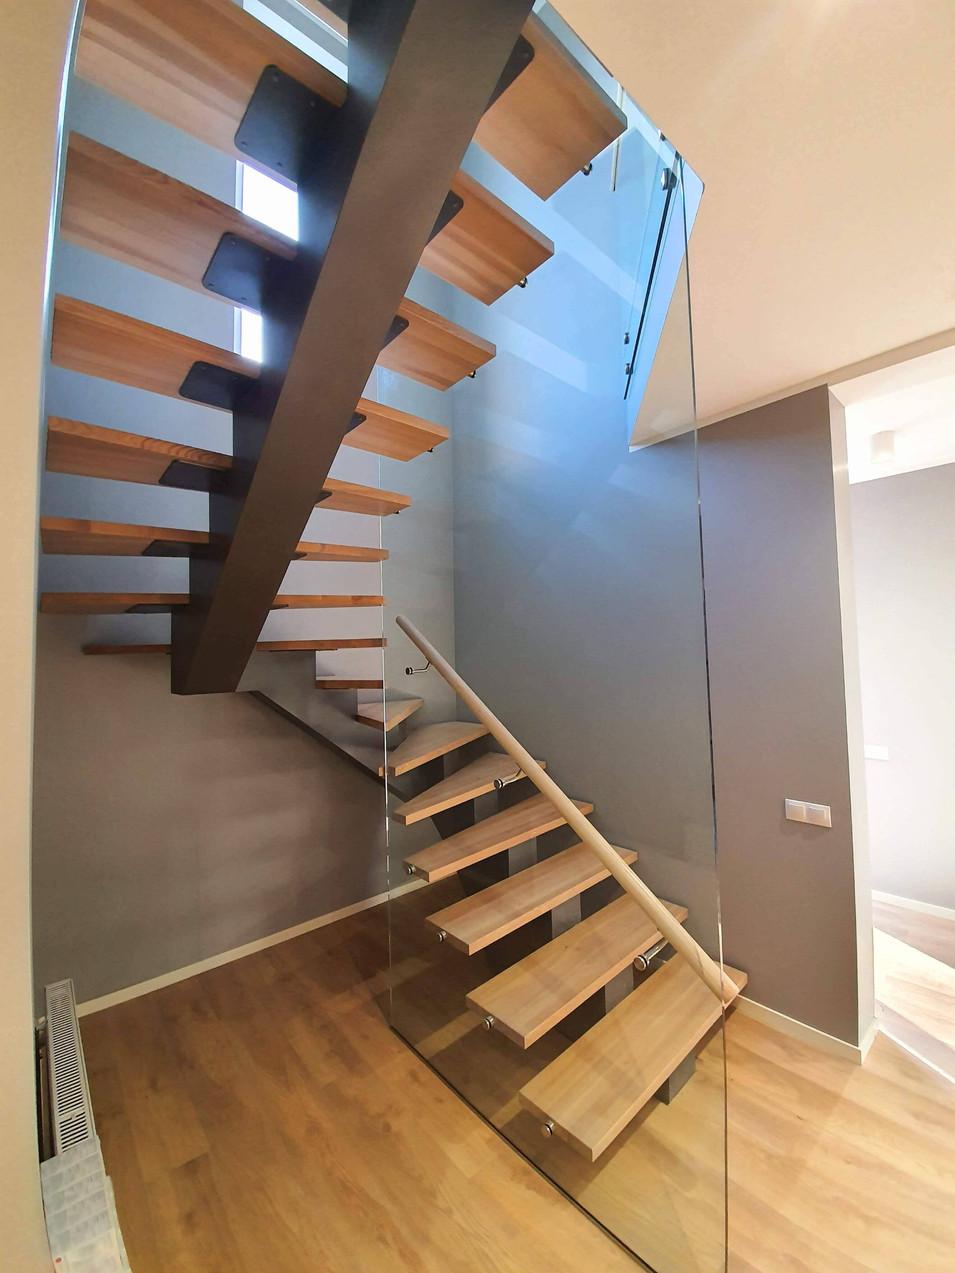 Fleksihus trapp